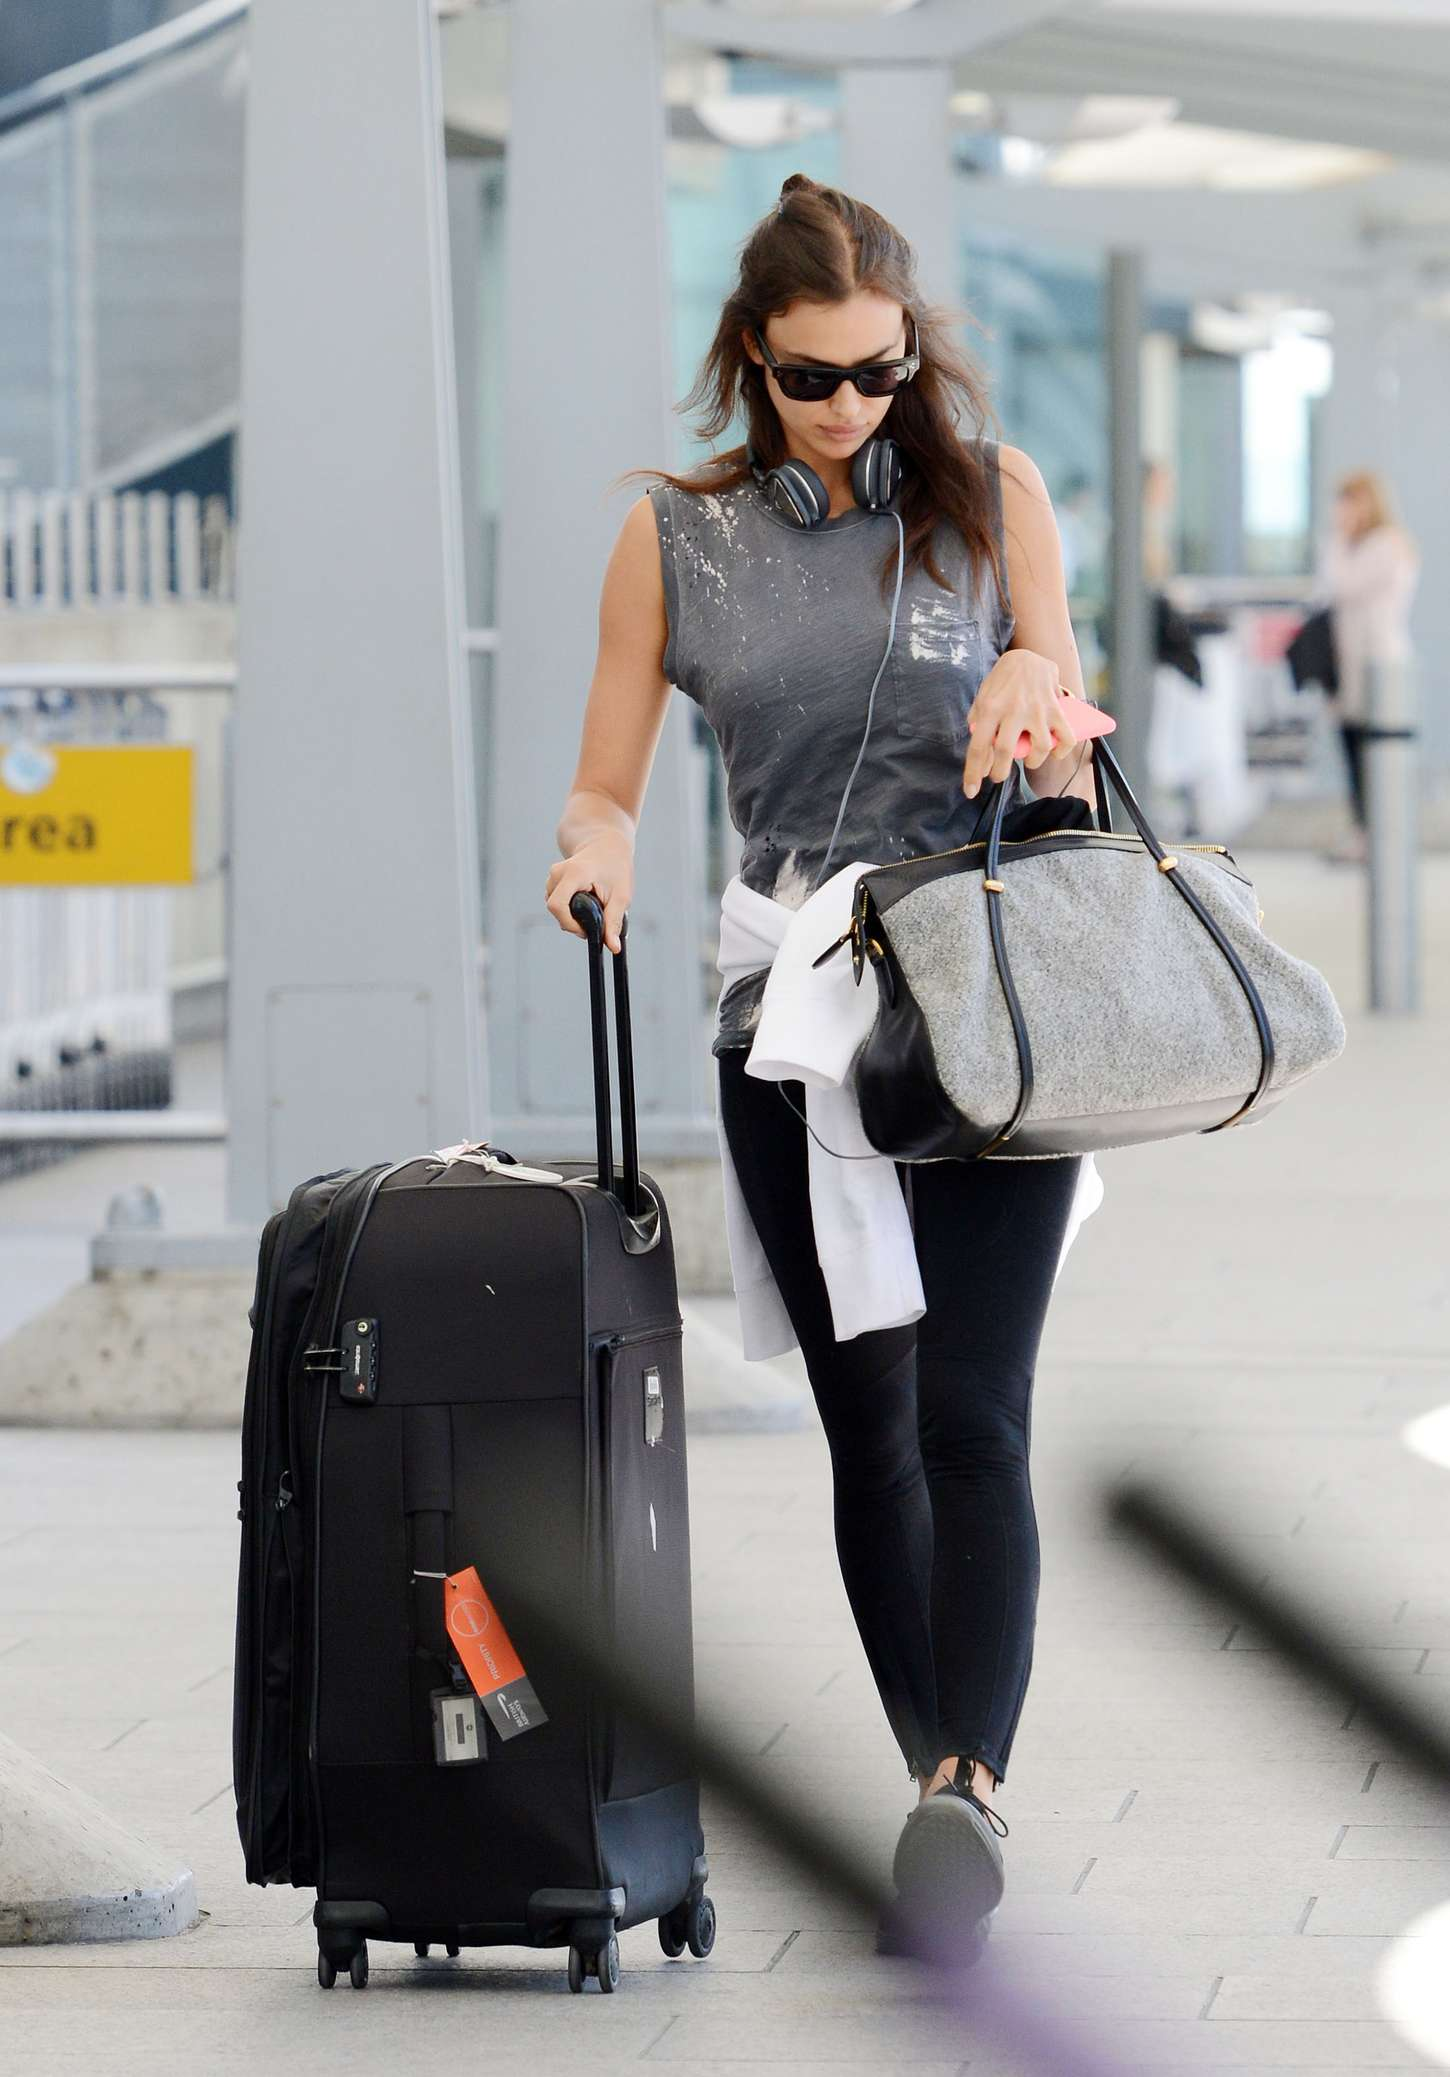 Irina Shayk 2015 : Irina Shayk in Leggings at Heathrow airport -02